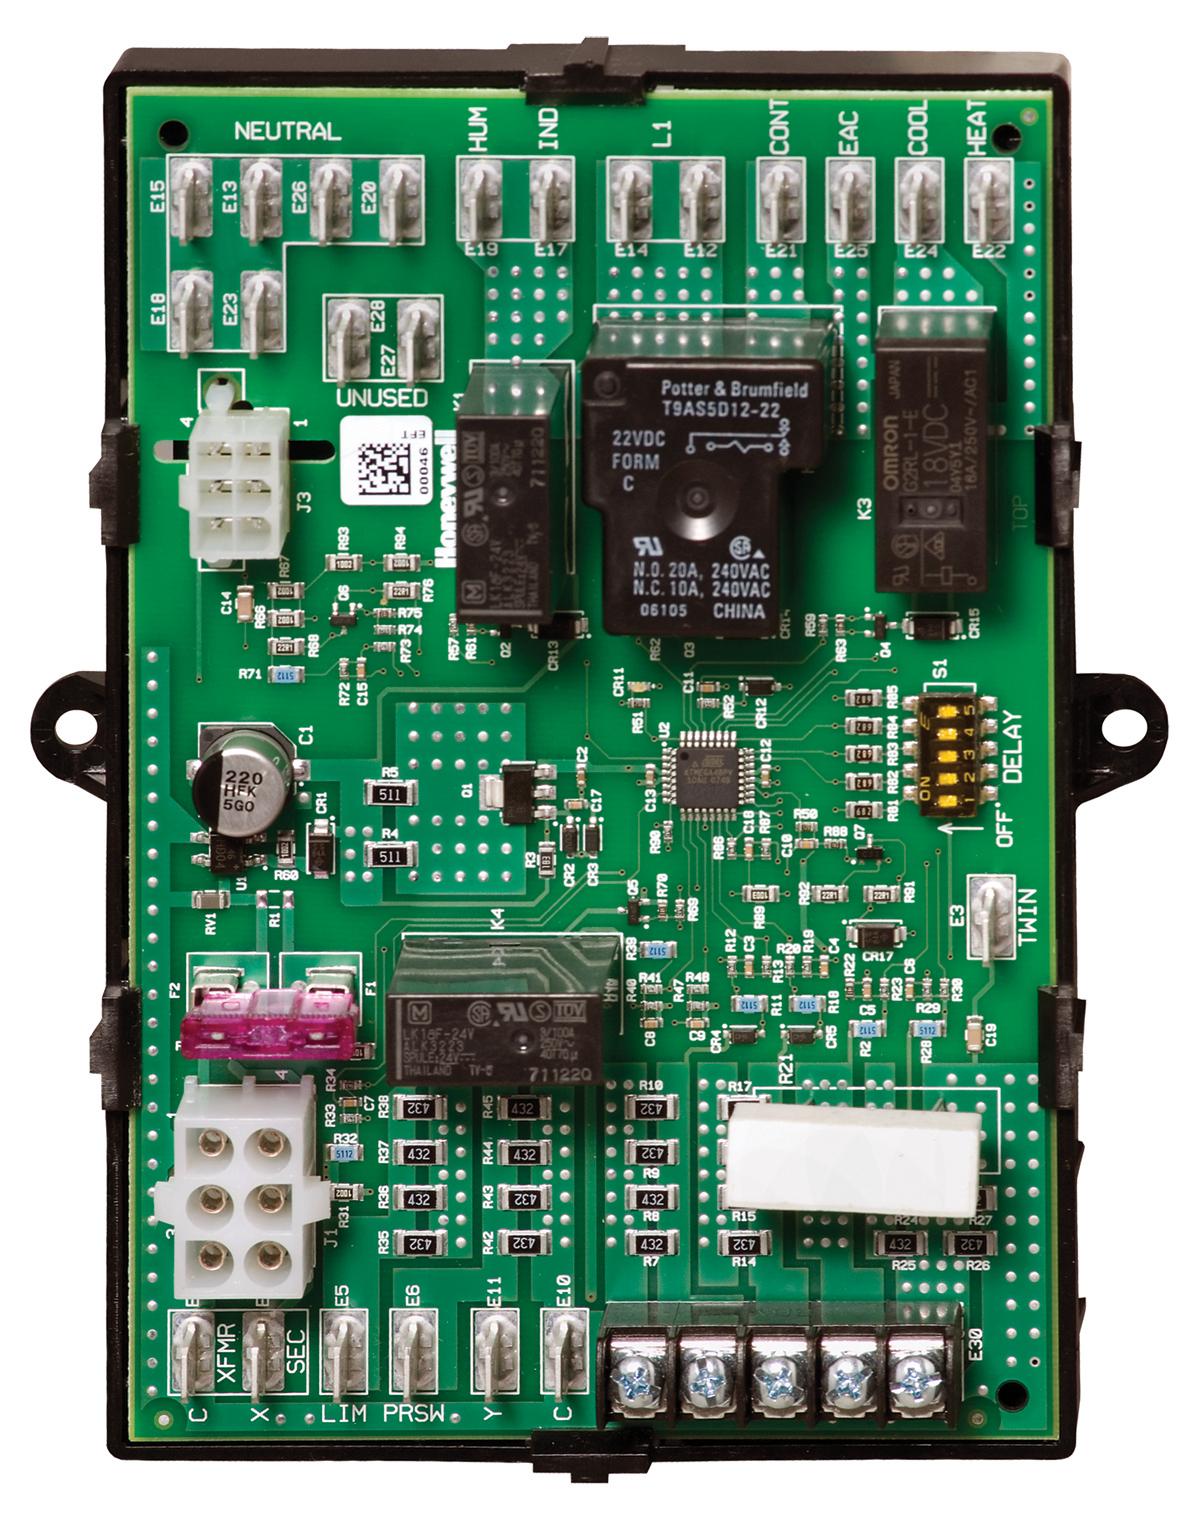 honeywell st9120u1011 universal electronic fan timer ... honeywell furnace circuit board wiring diagram carrier furnace circuit board wiring schematic